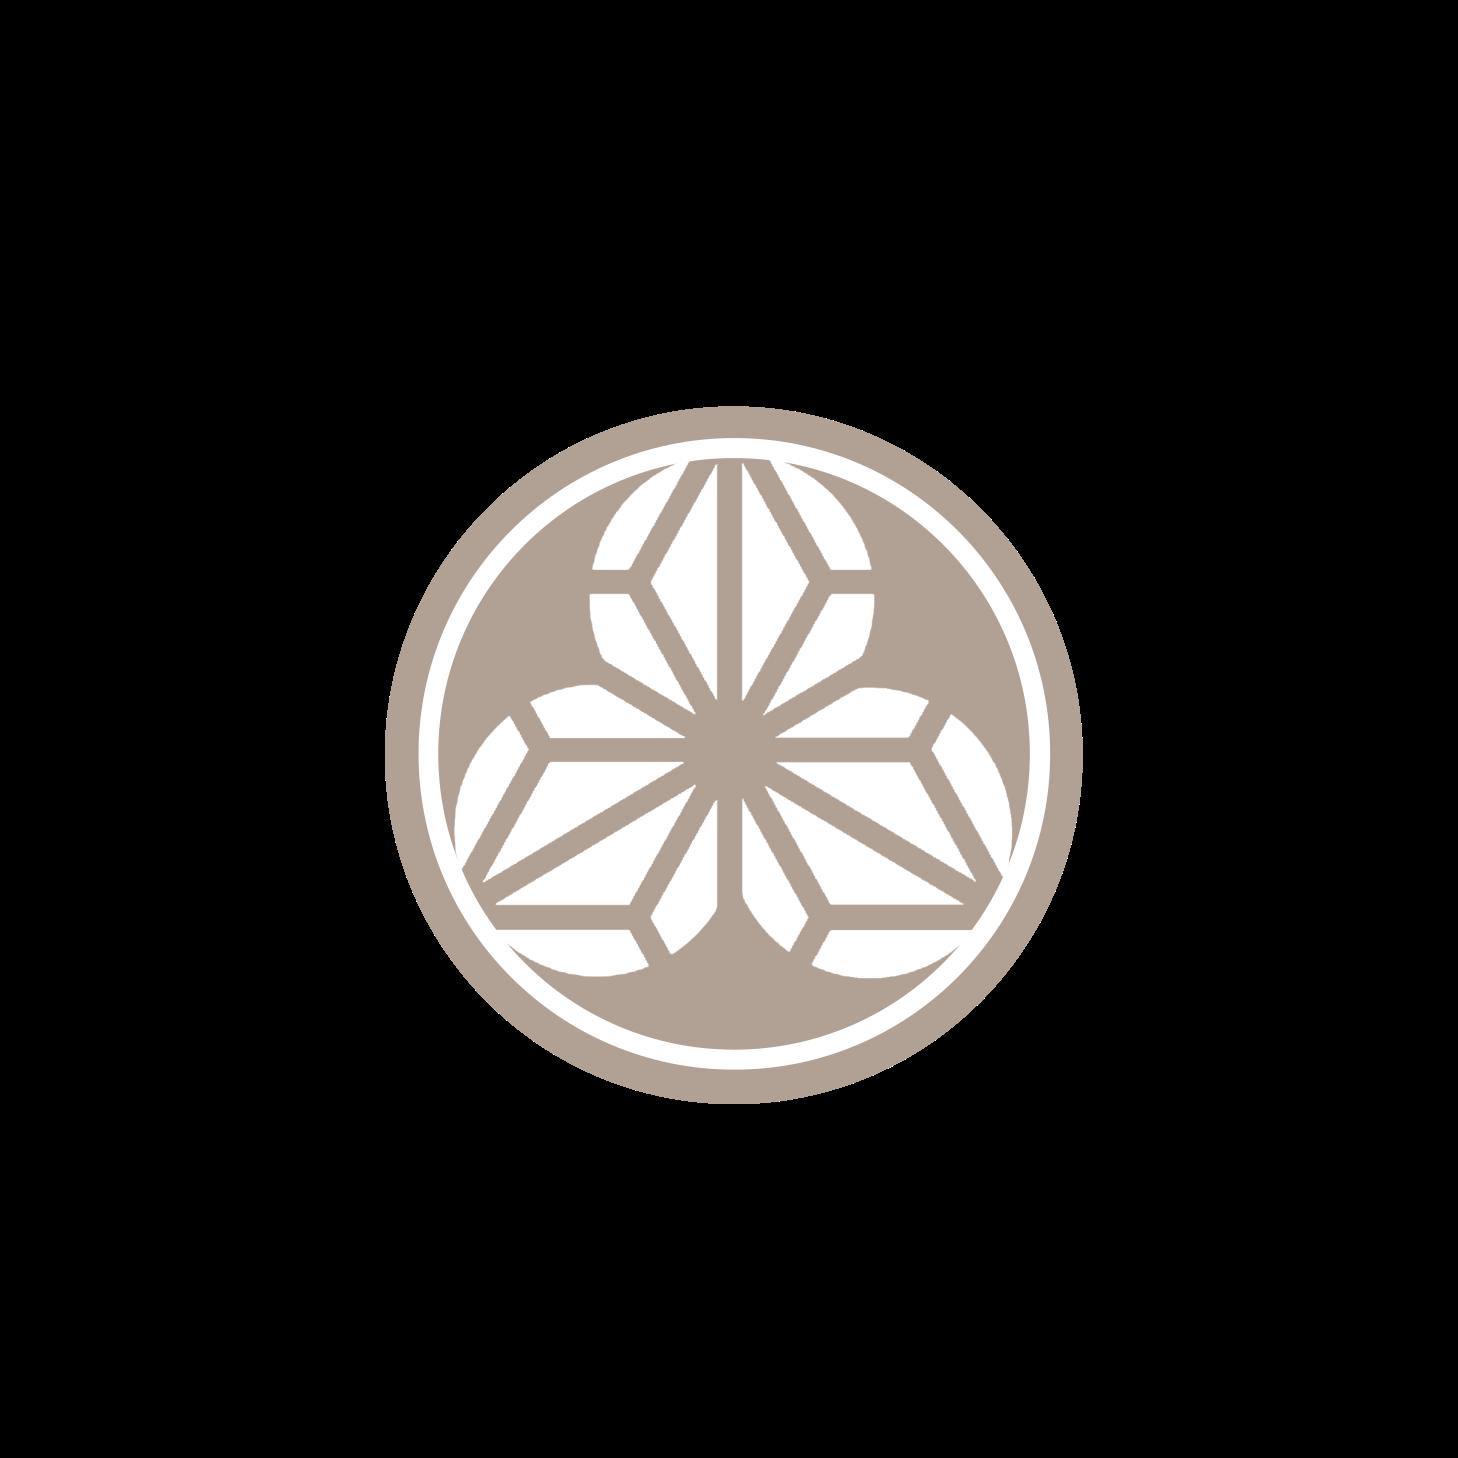 threewisemonkeys_logo